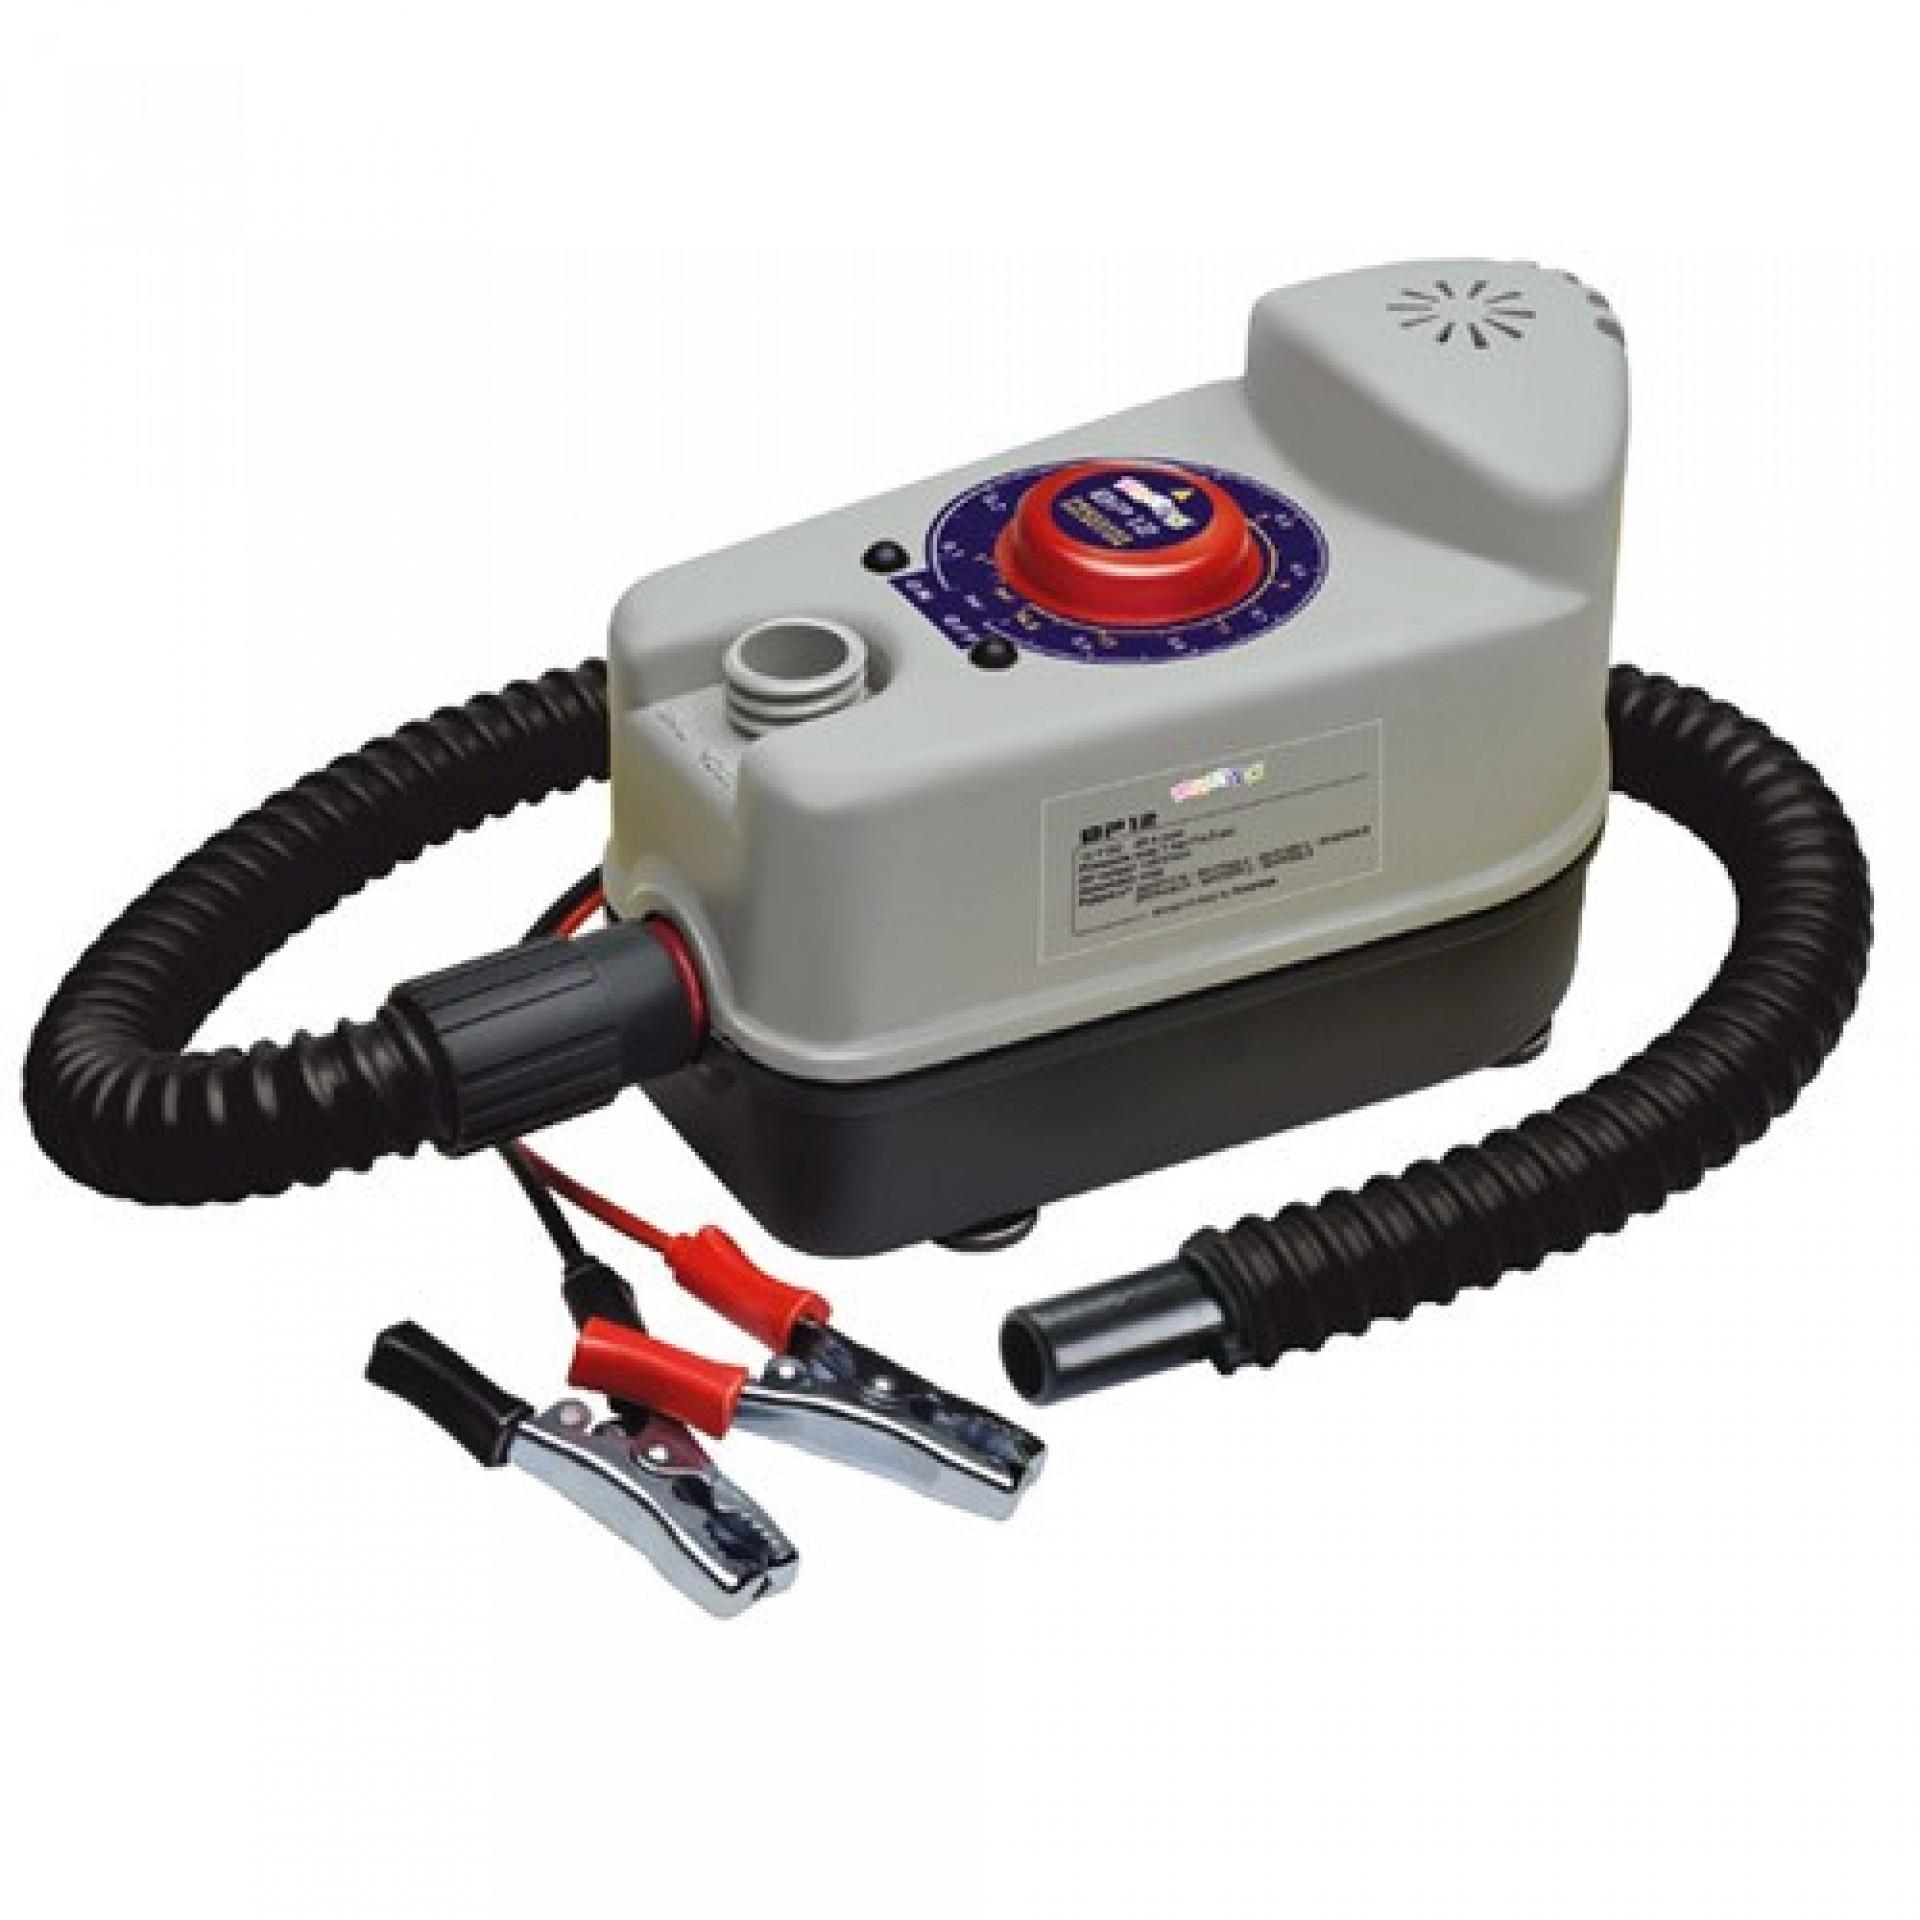 Pumpy a kompresory